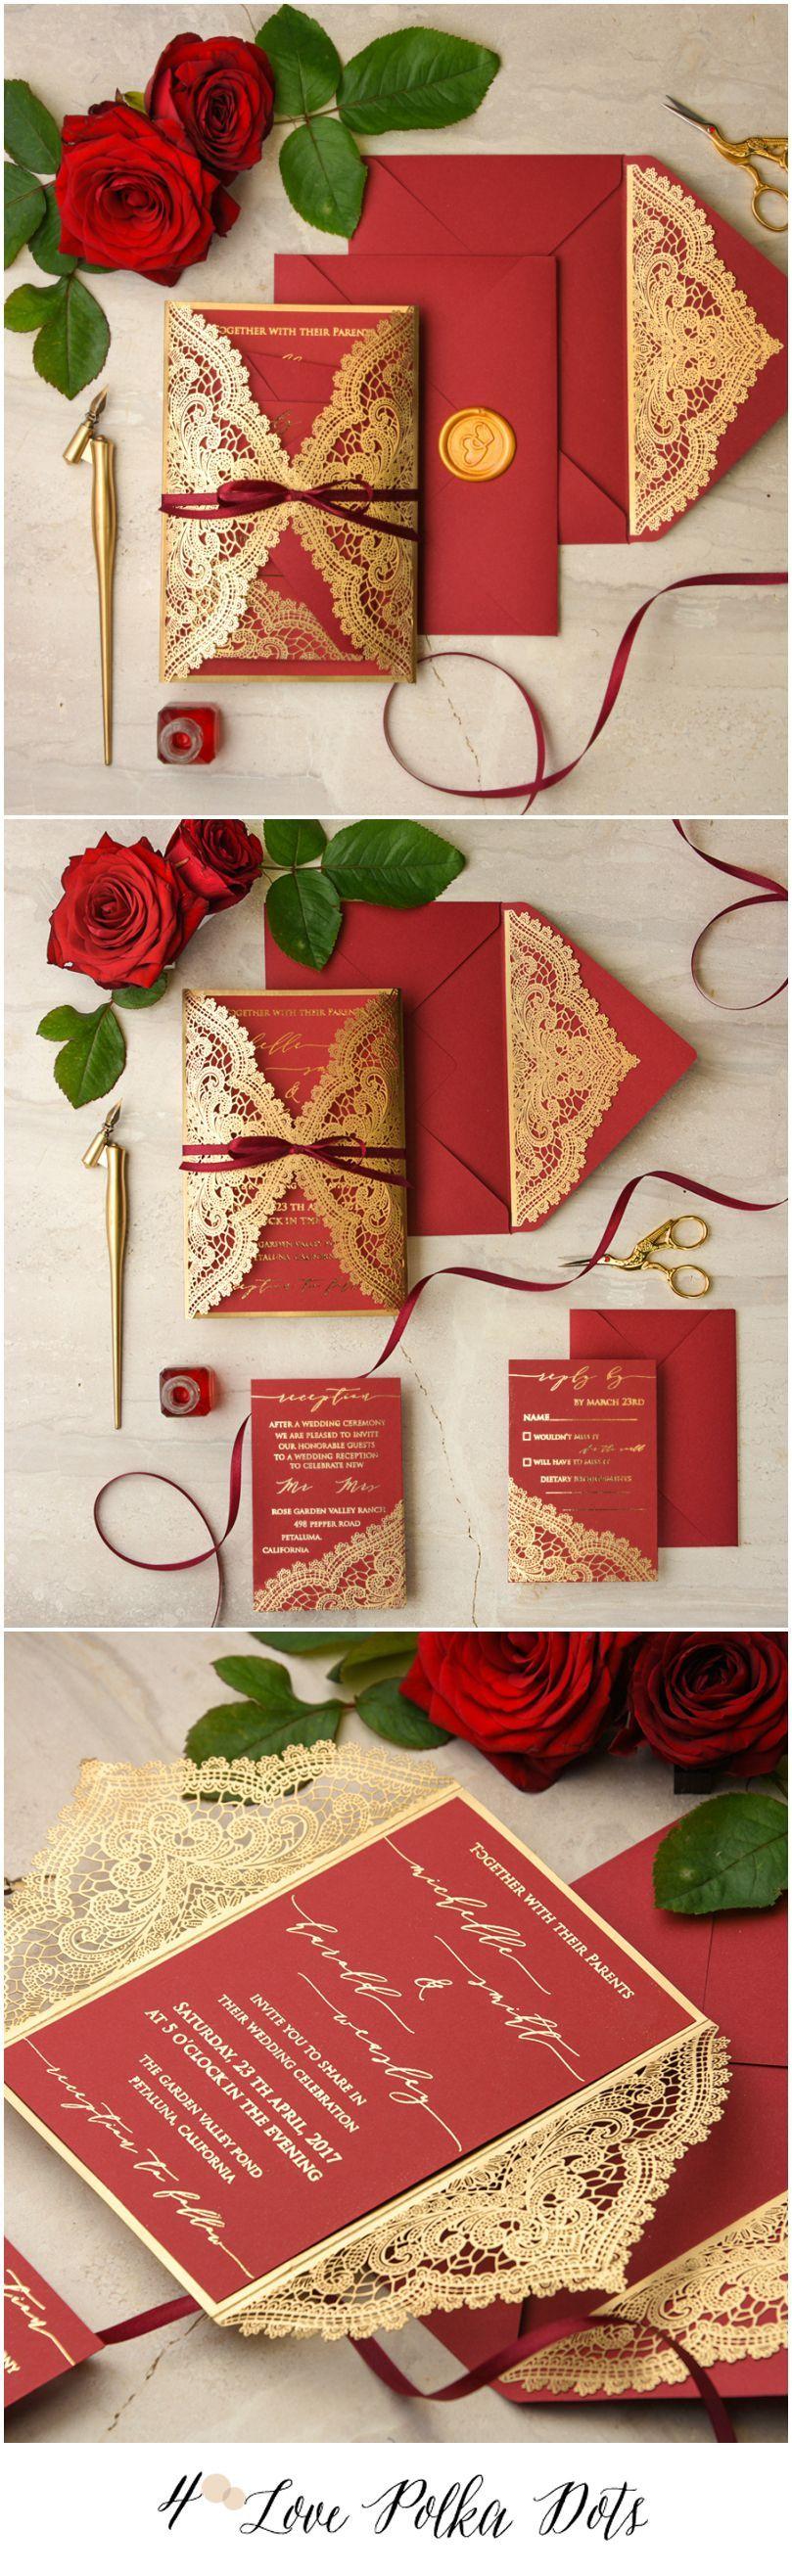 lace wedding invitation wrap%0A Red  u     Gold laser cut lace romantic wedding invitations  sponsored